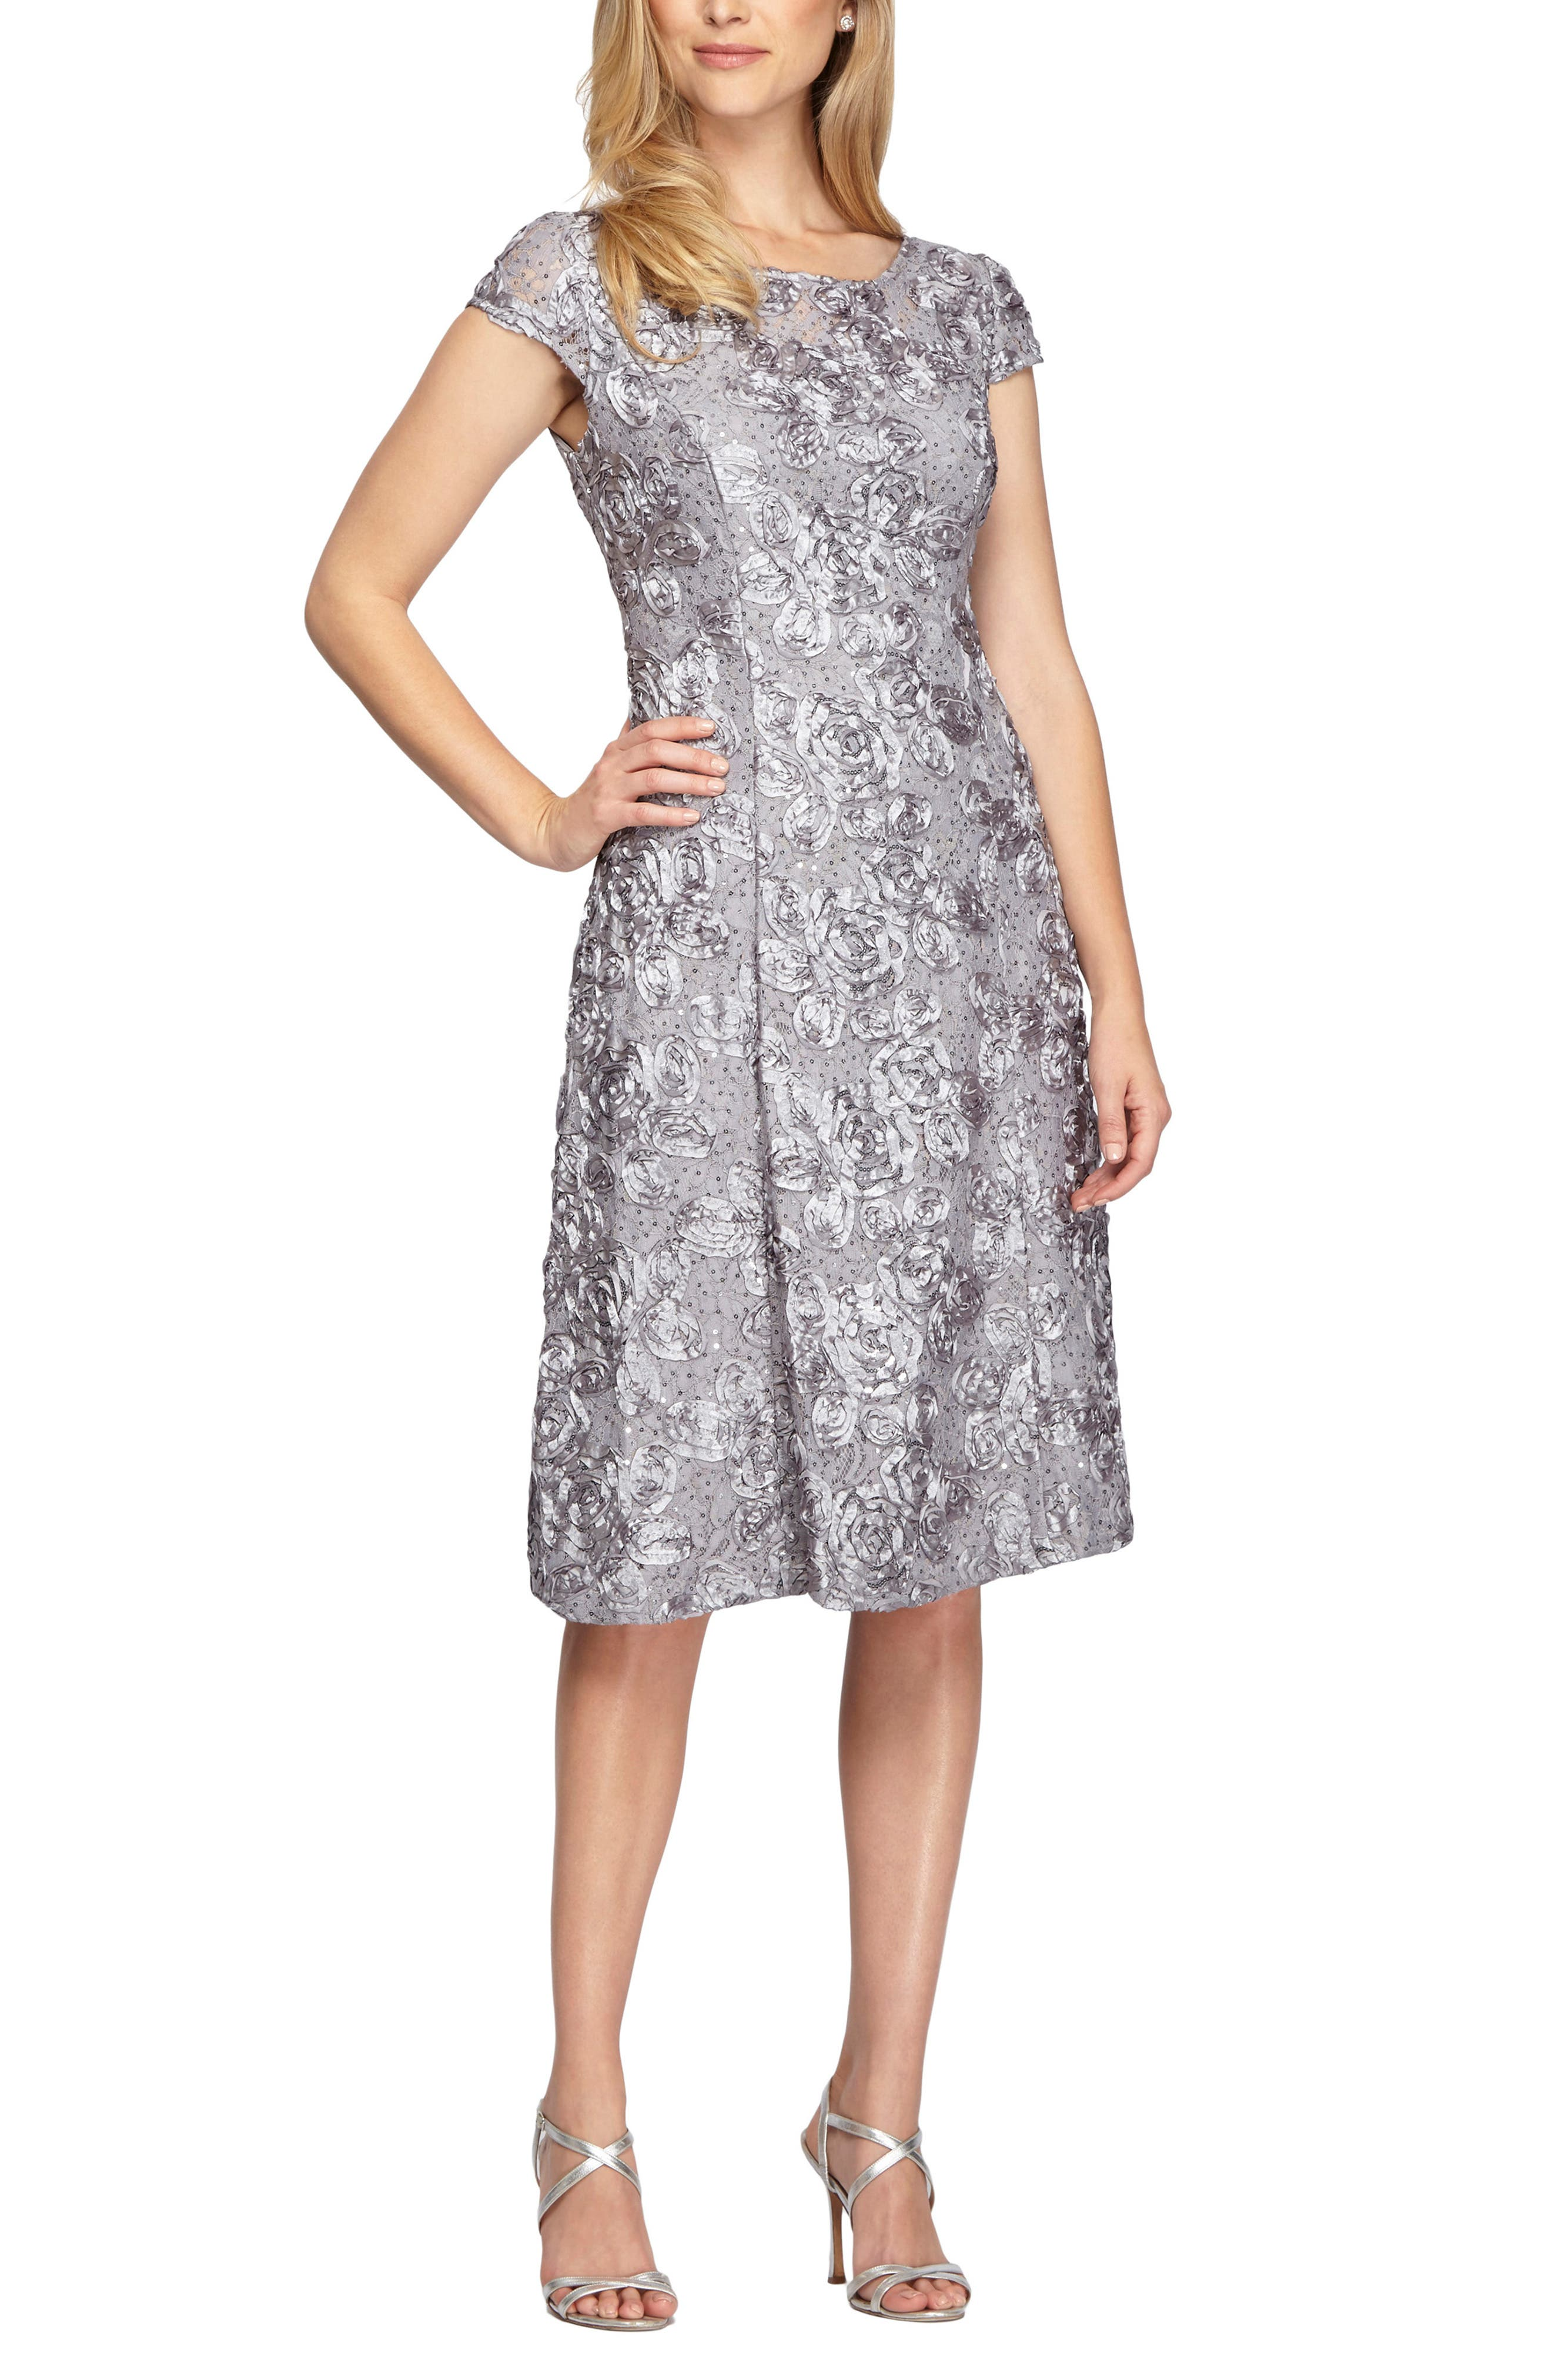 Sequin Rosette Cocktail Dress